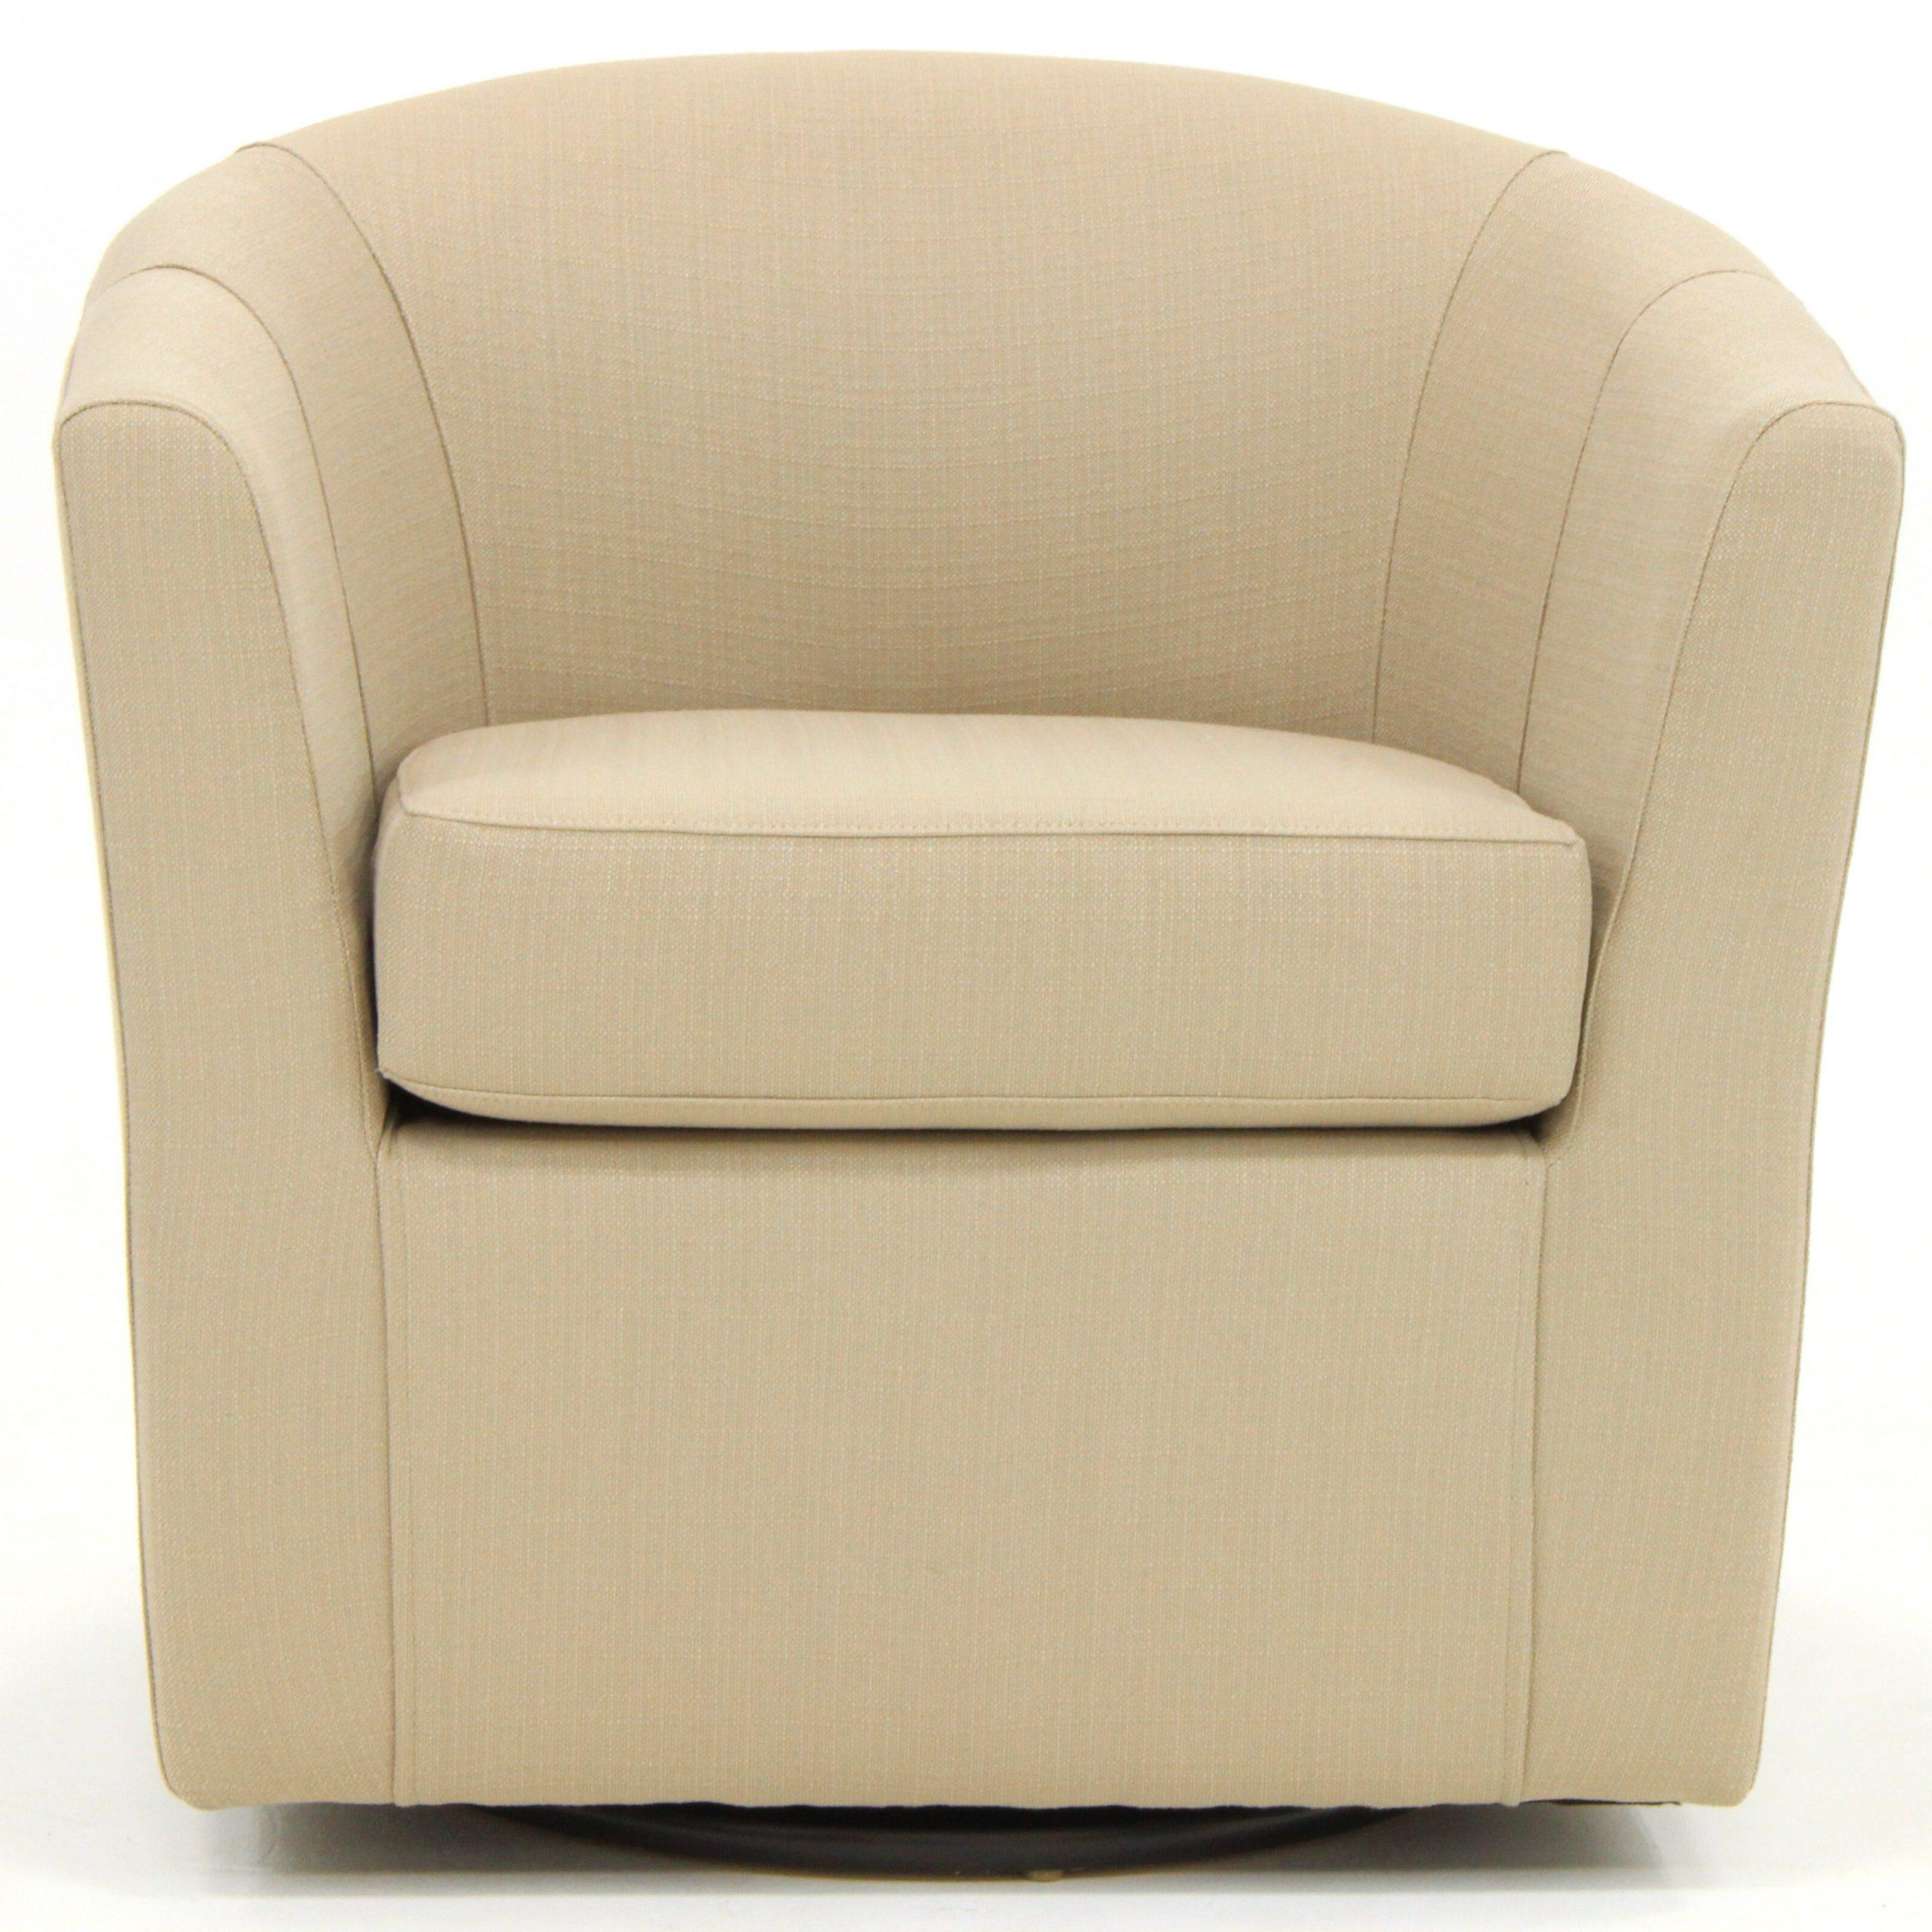 Molinari Swivel Barrel Chairs Inside Most Up To Date Molinari Swivel Barrel Chair (View 5 of 20)